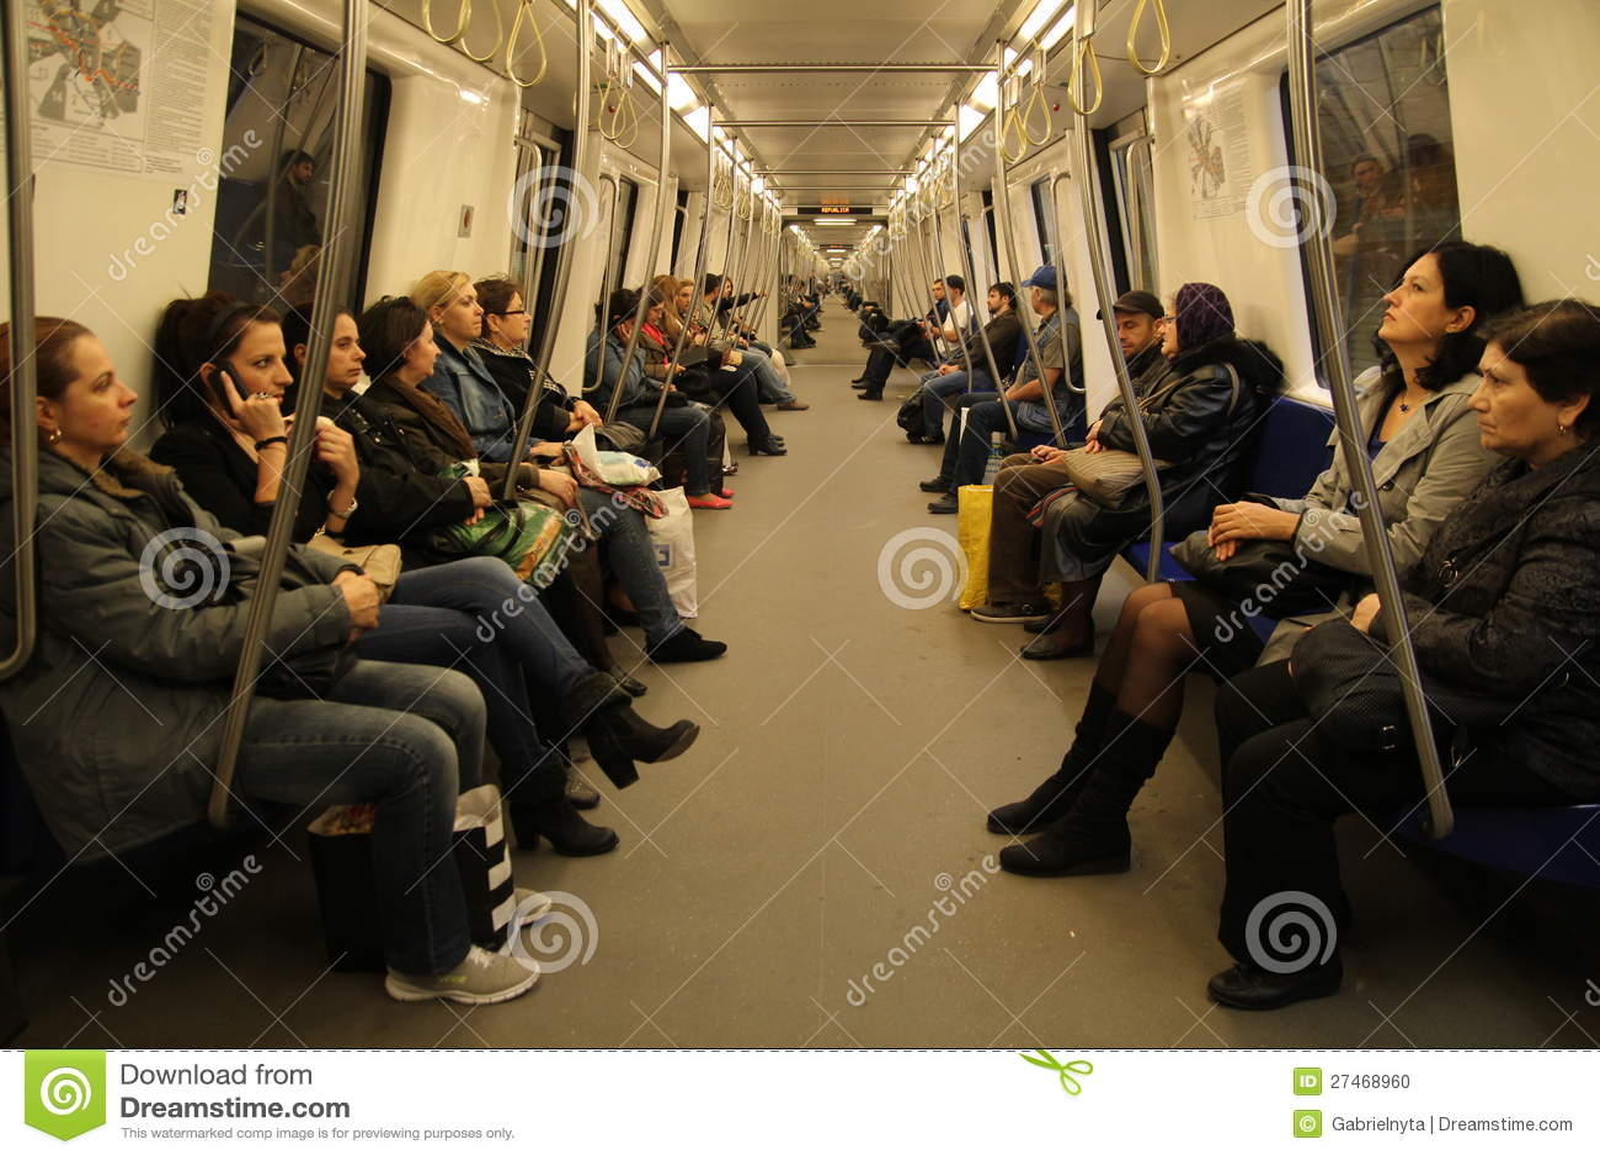 Inside metro